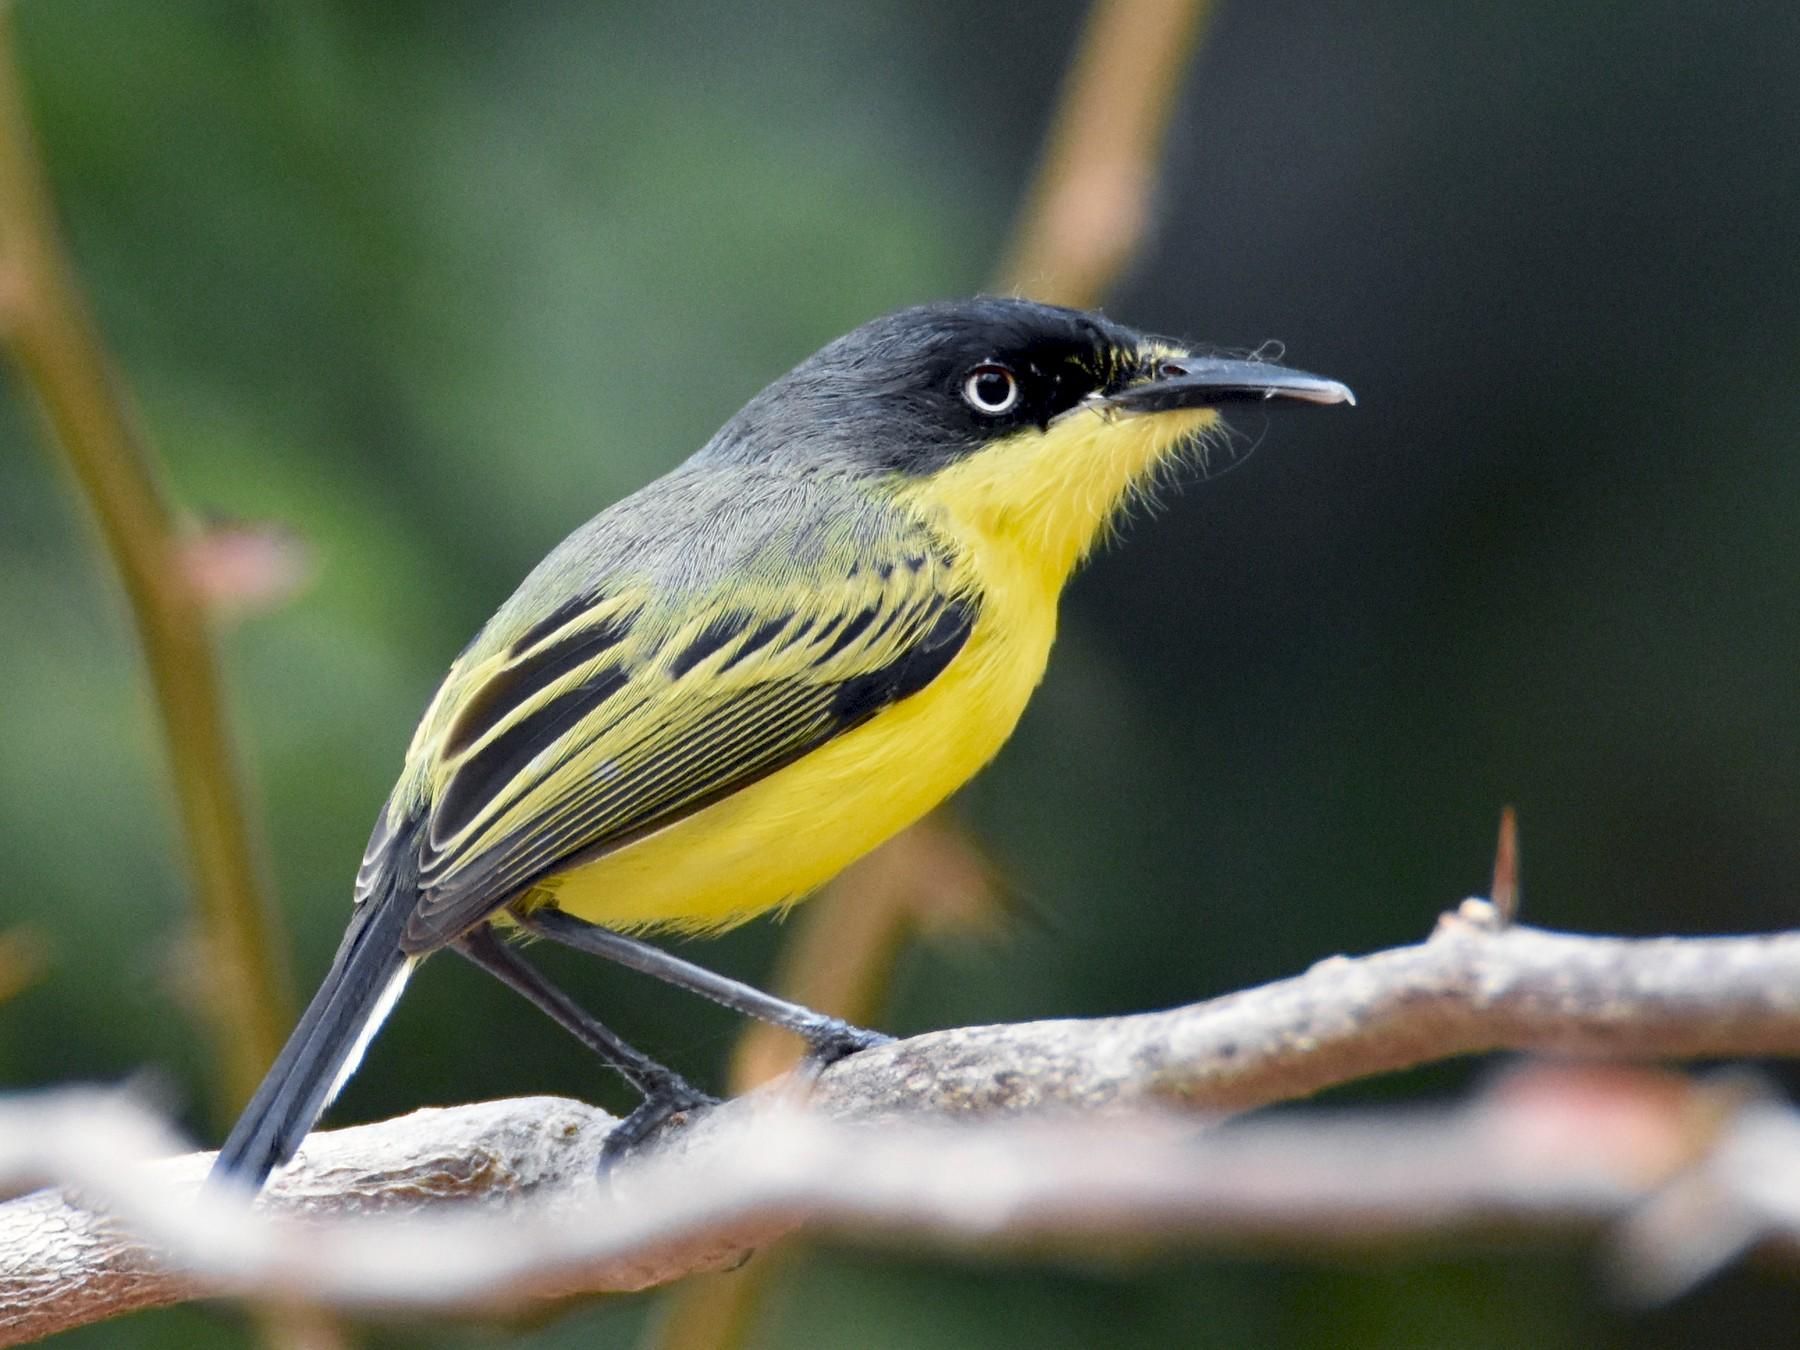 Common Tody-Flycatcher - Luke Berg